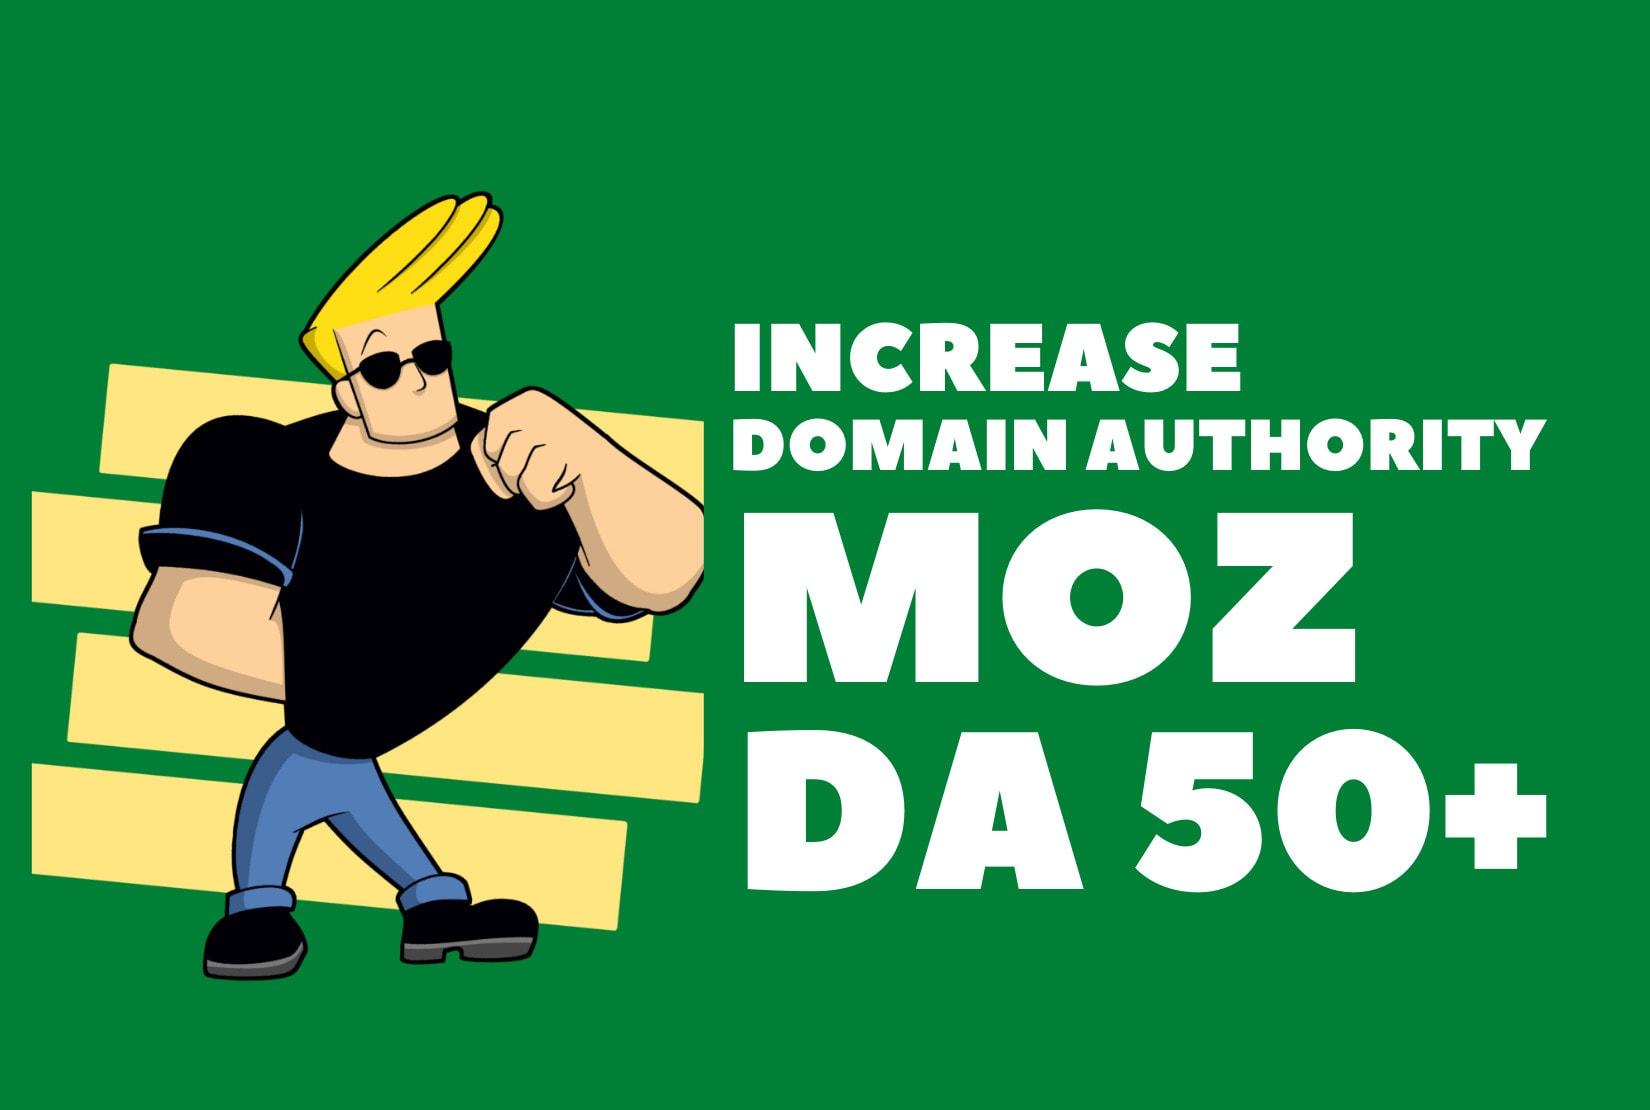 I will increase moz domain authority da 50 plus, authority backlinks